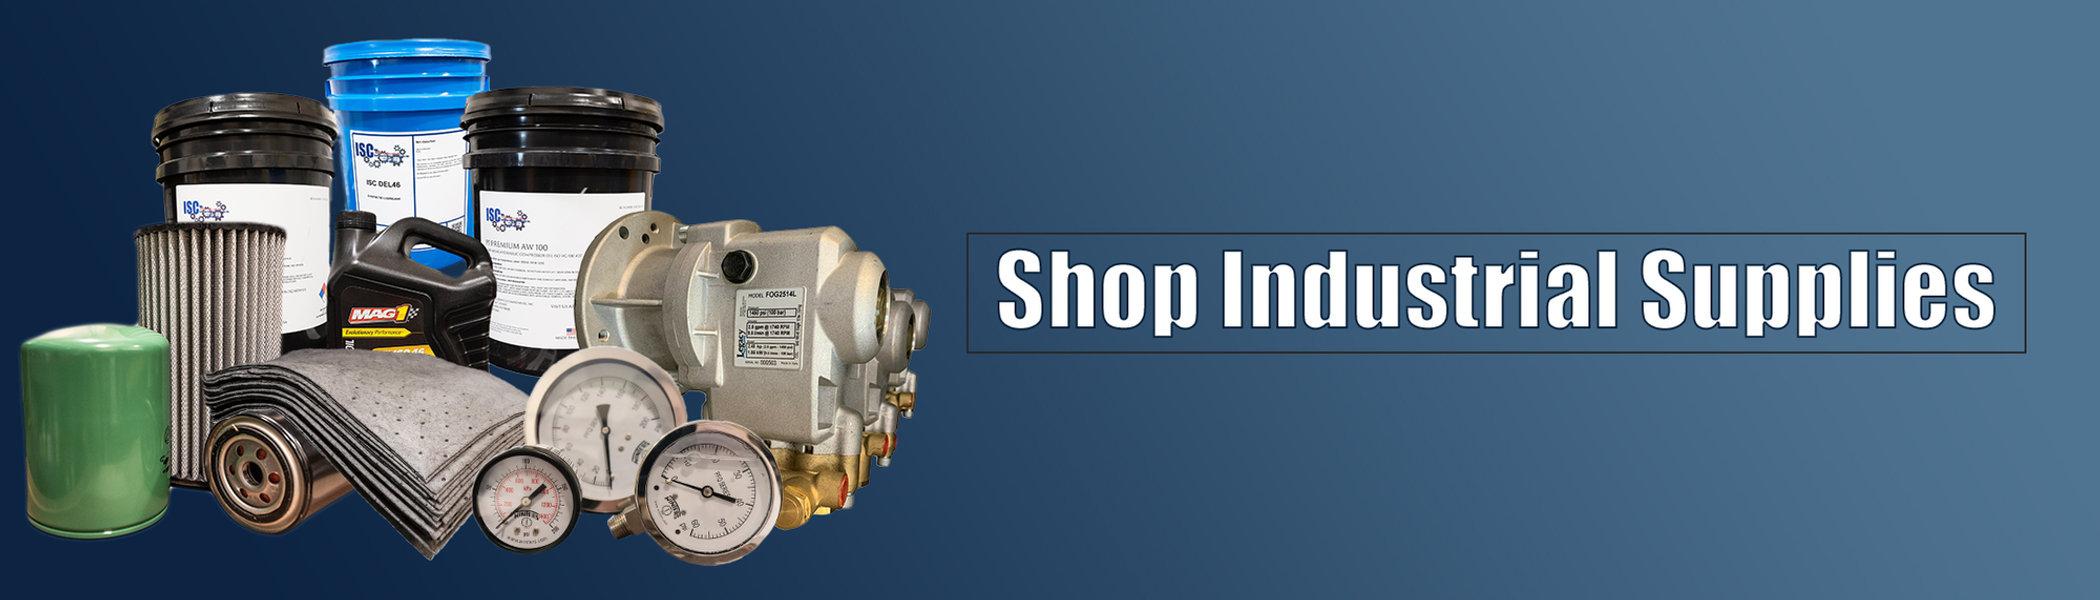 shop industrial supplies.jpg